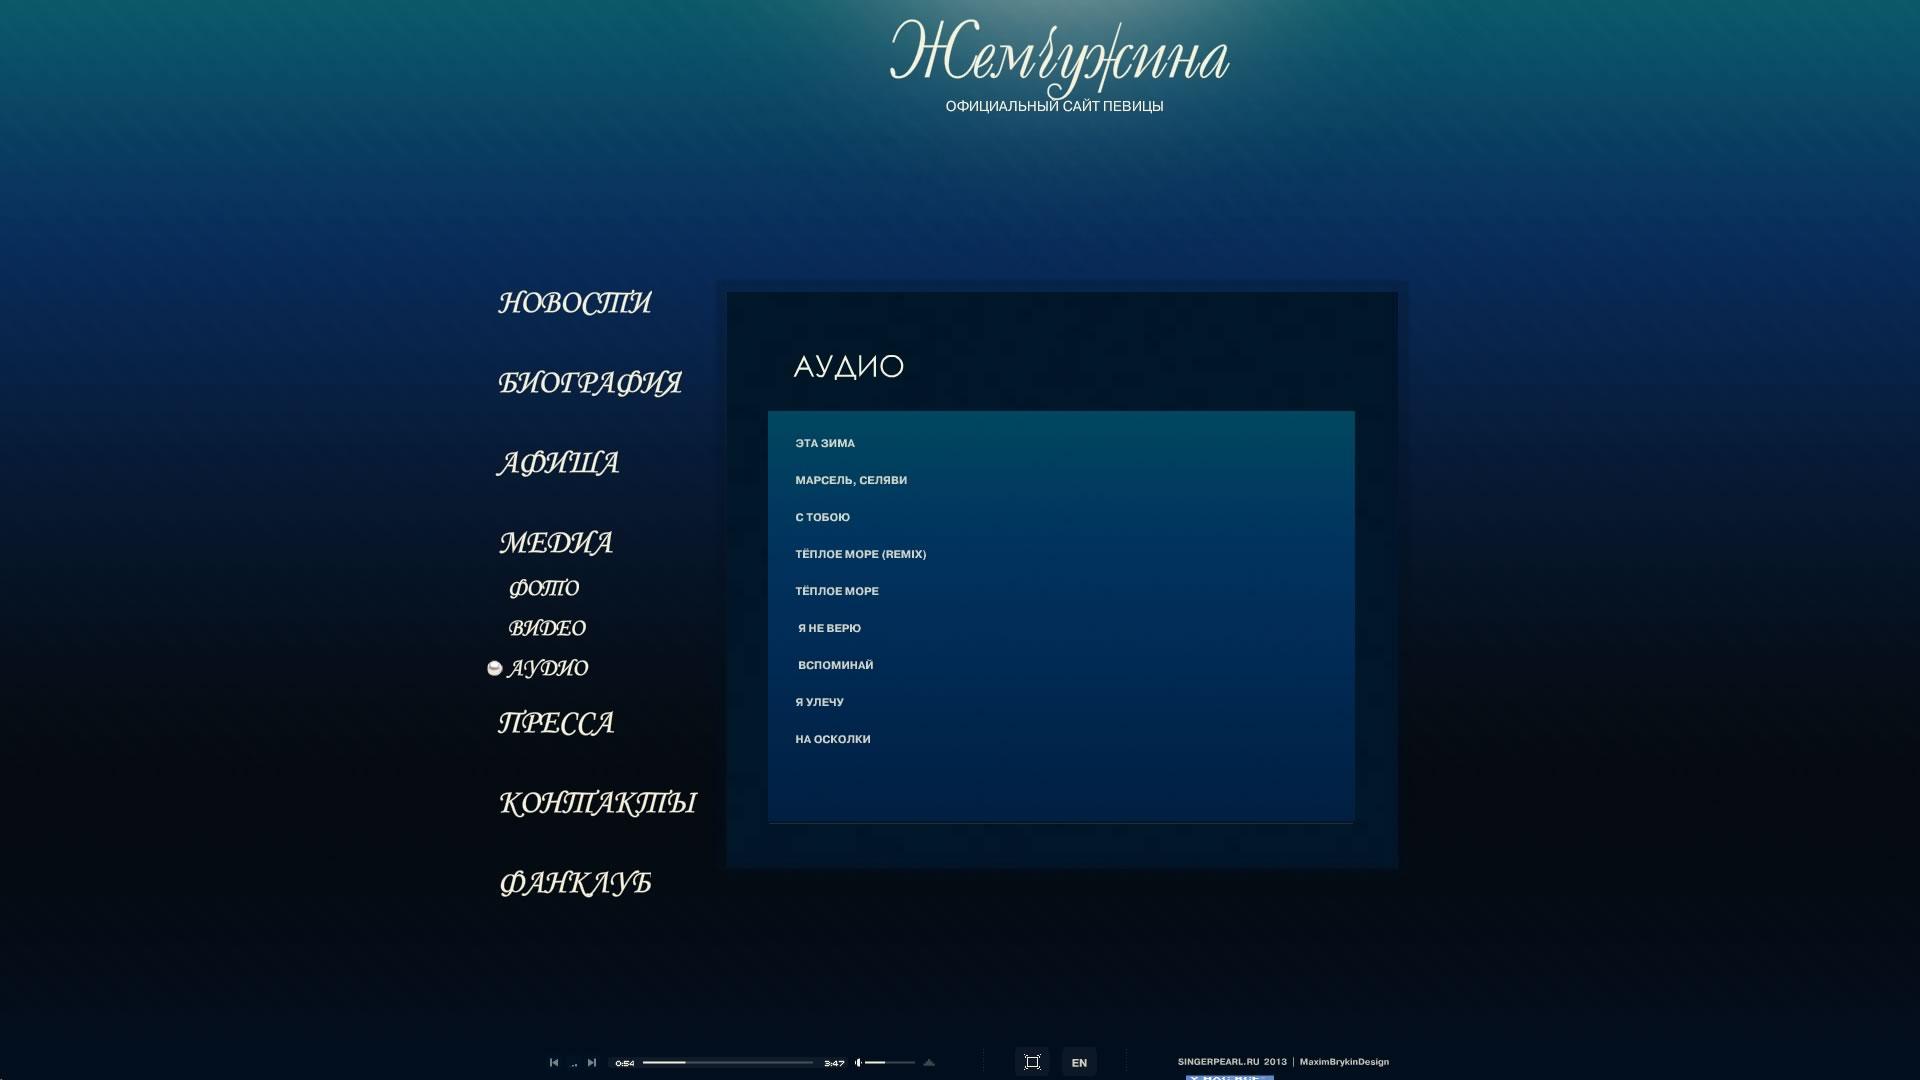 Создание сайта singerpearl.ru (flash) (8)